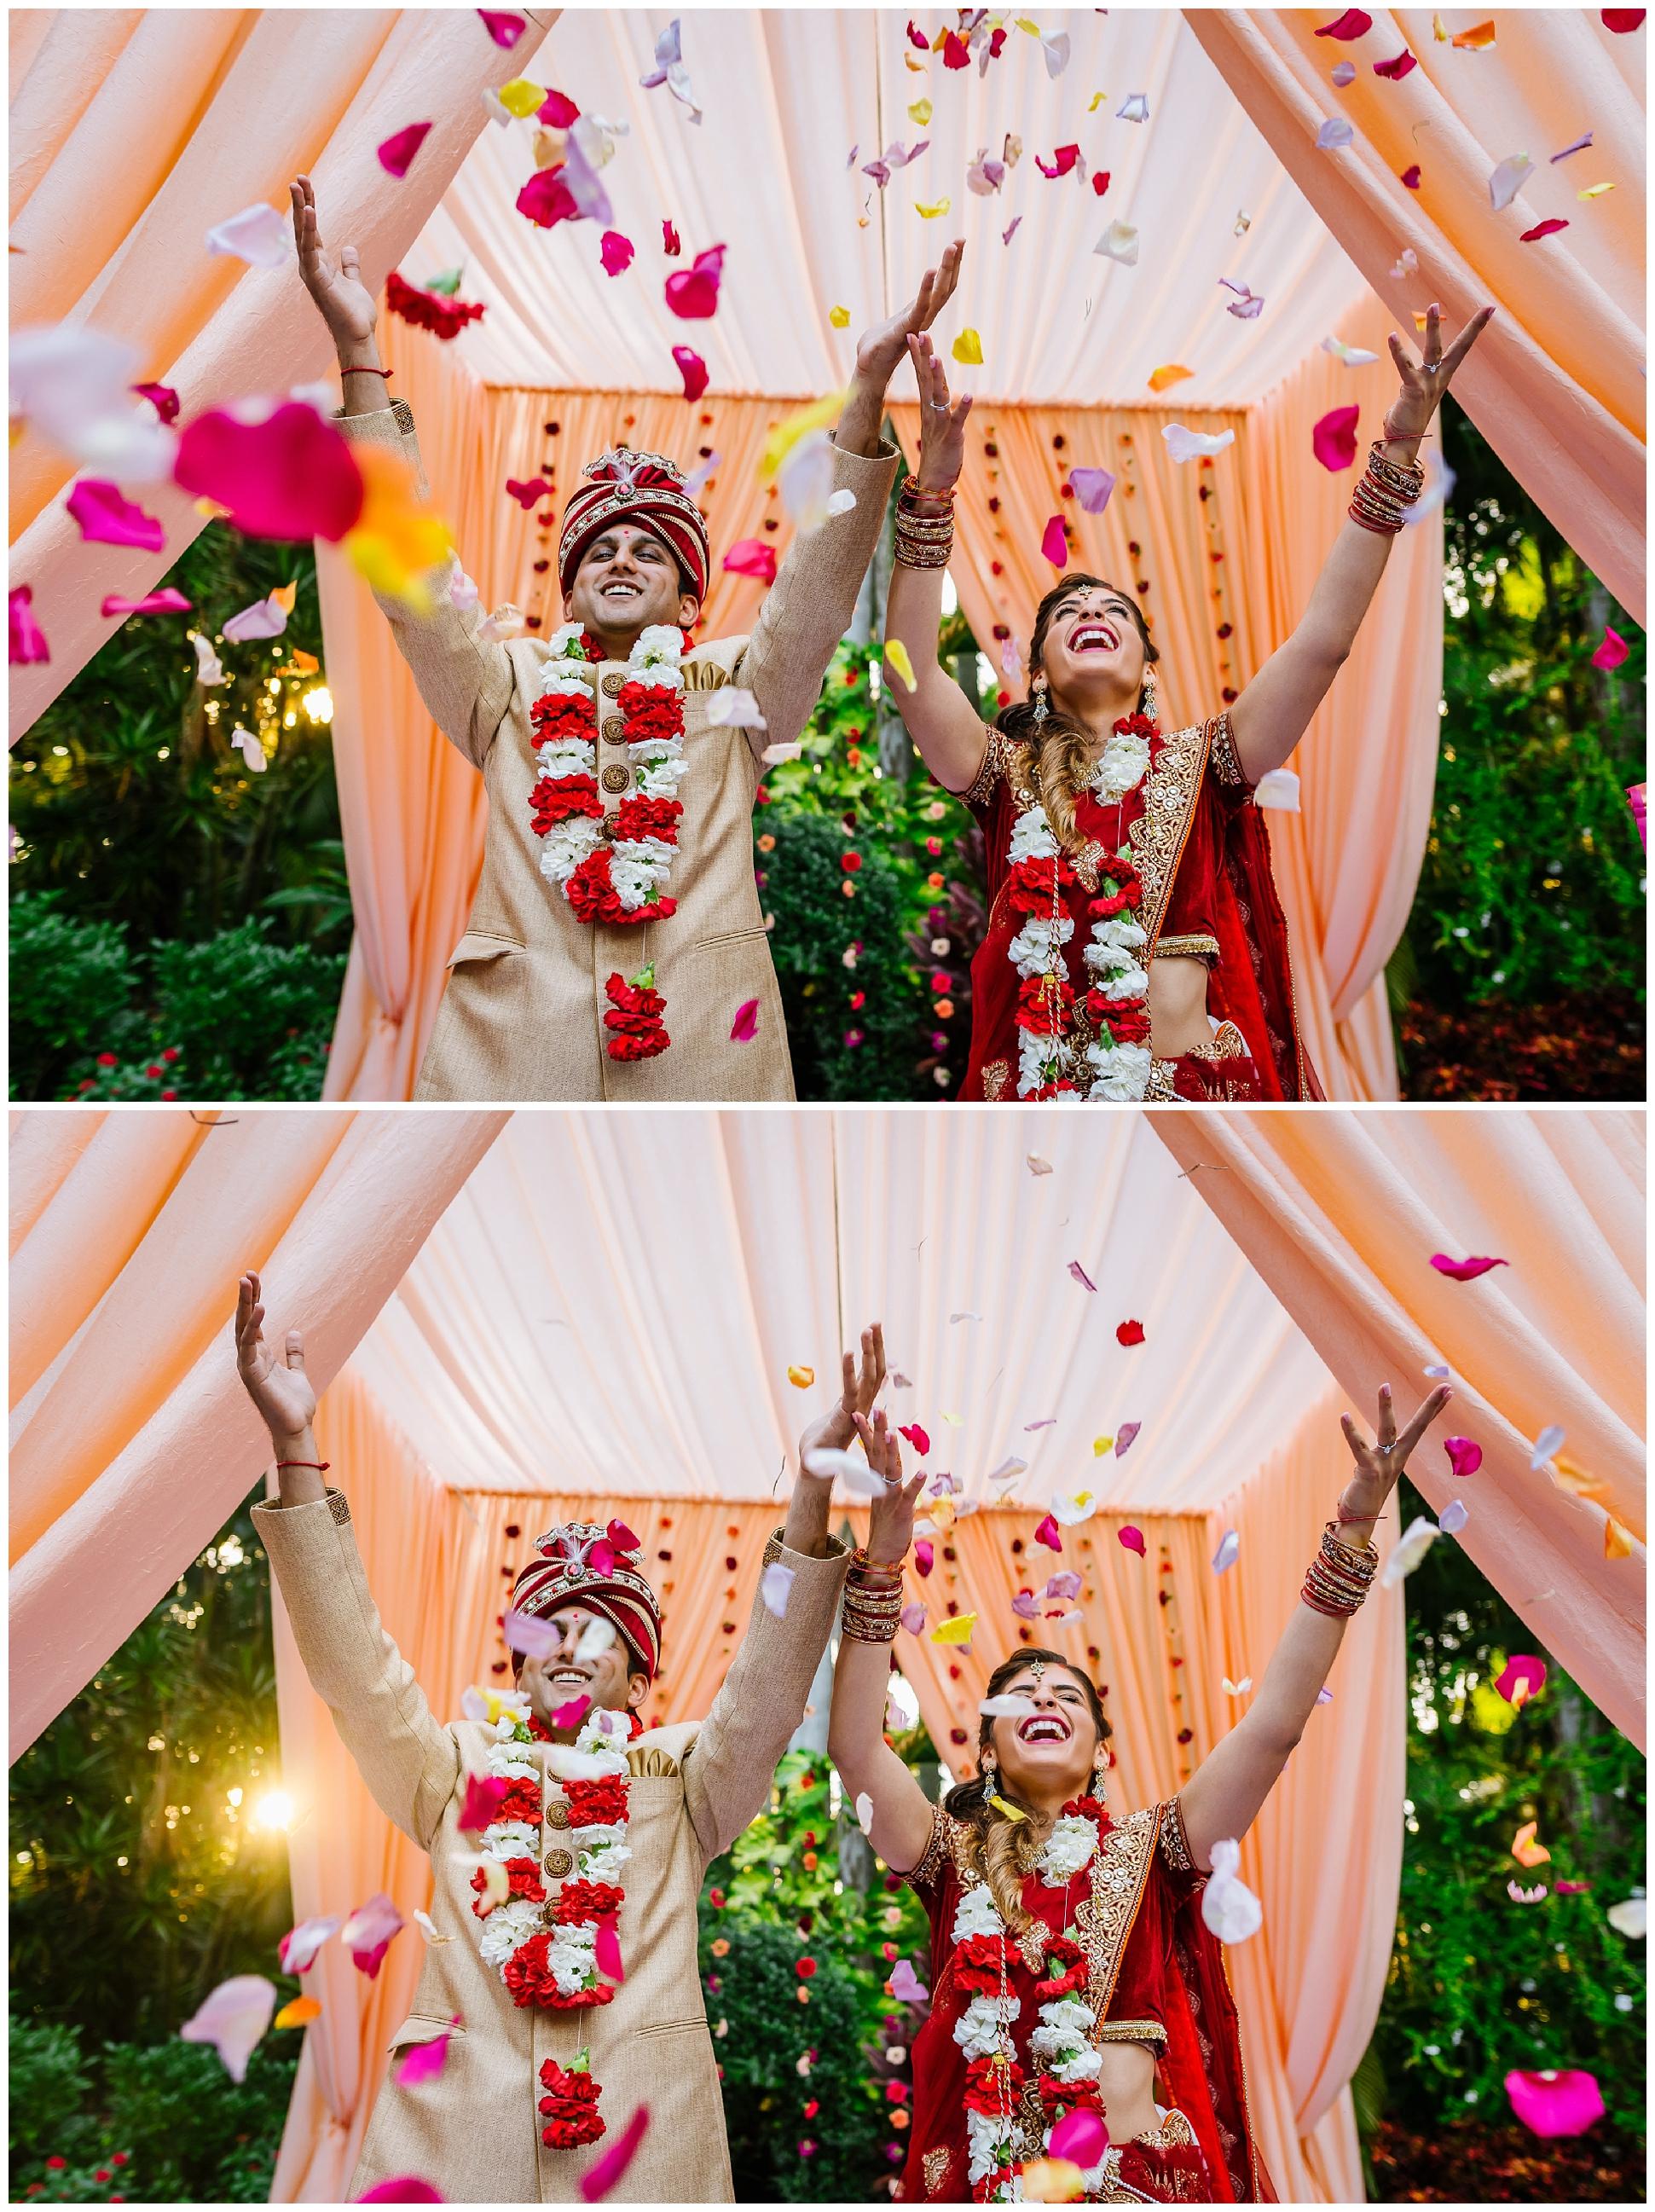 St-pete-indian-wedding-photographer-barat-sunken-gardens_0125.jpg